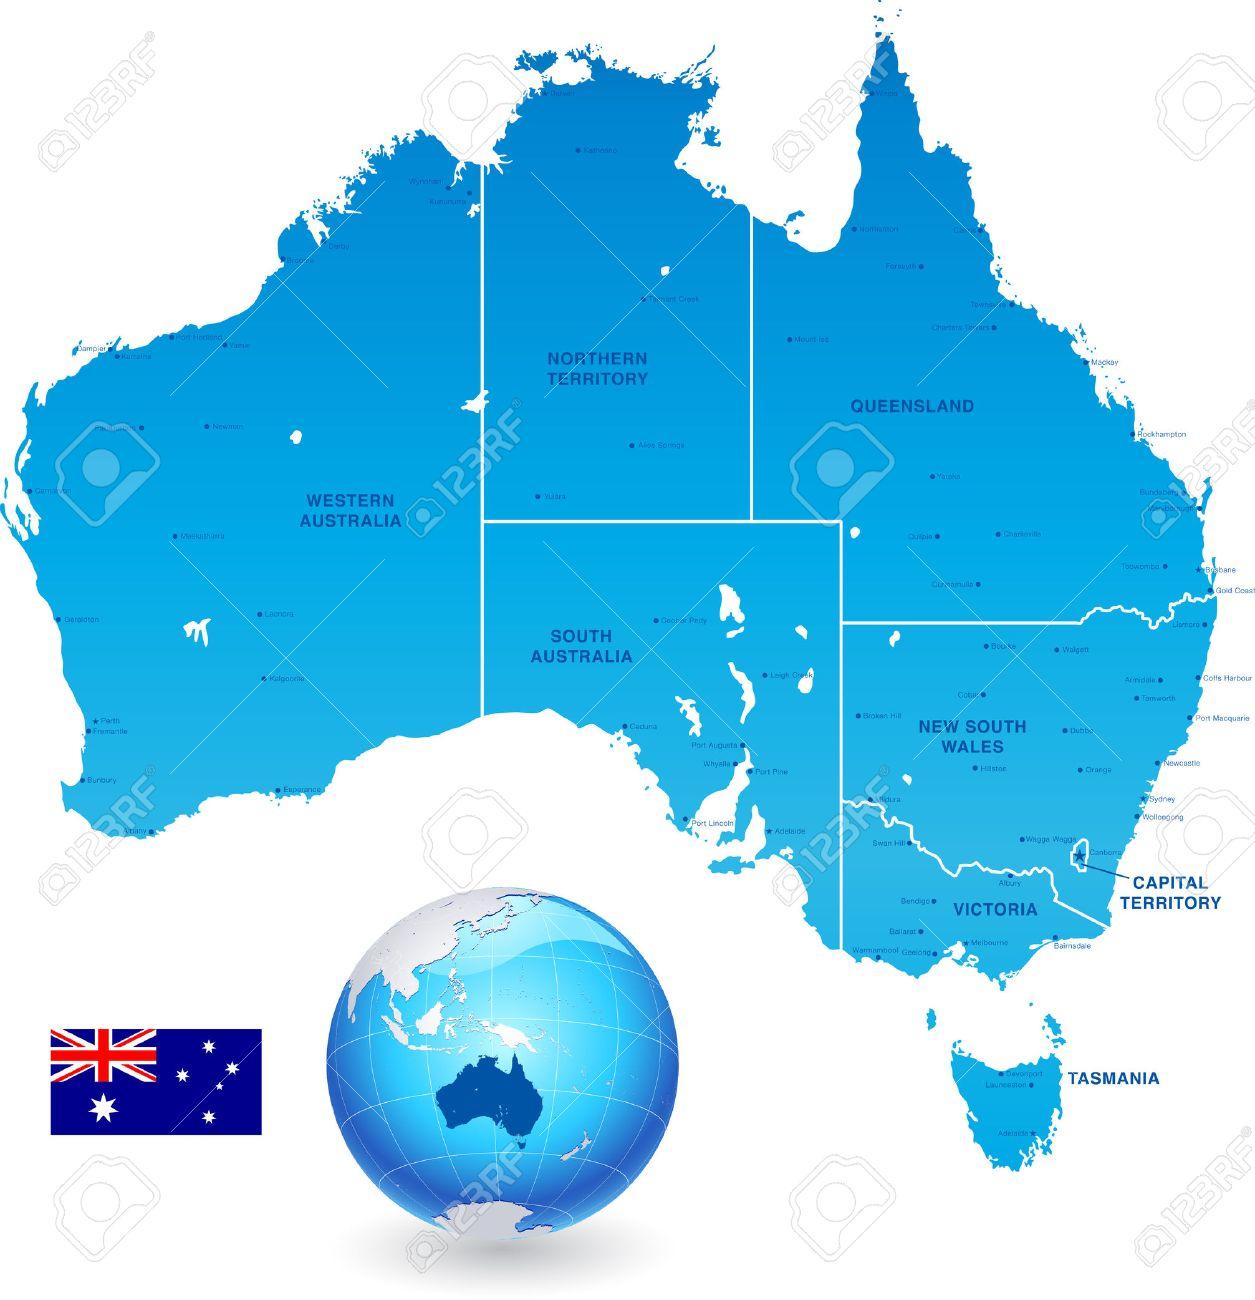 Carte Australie Grande Ville.Haute Detail Vecteur Carte De L Australie Les Etats Et Les Grandes